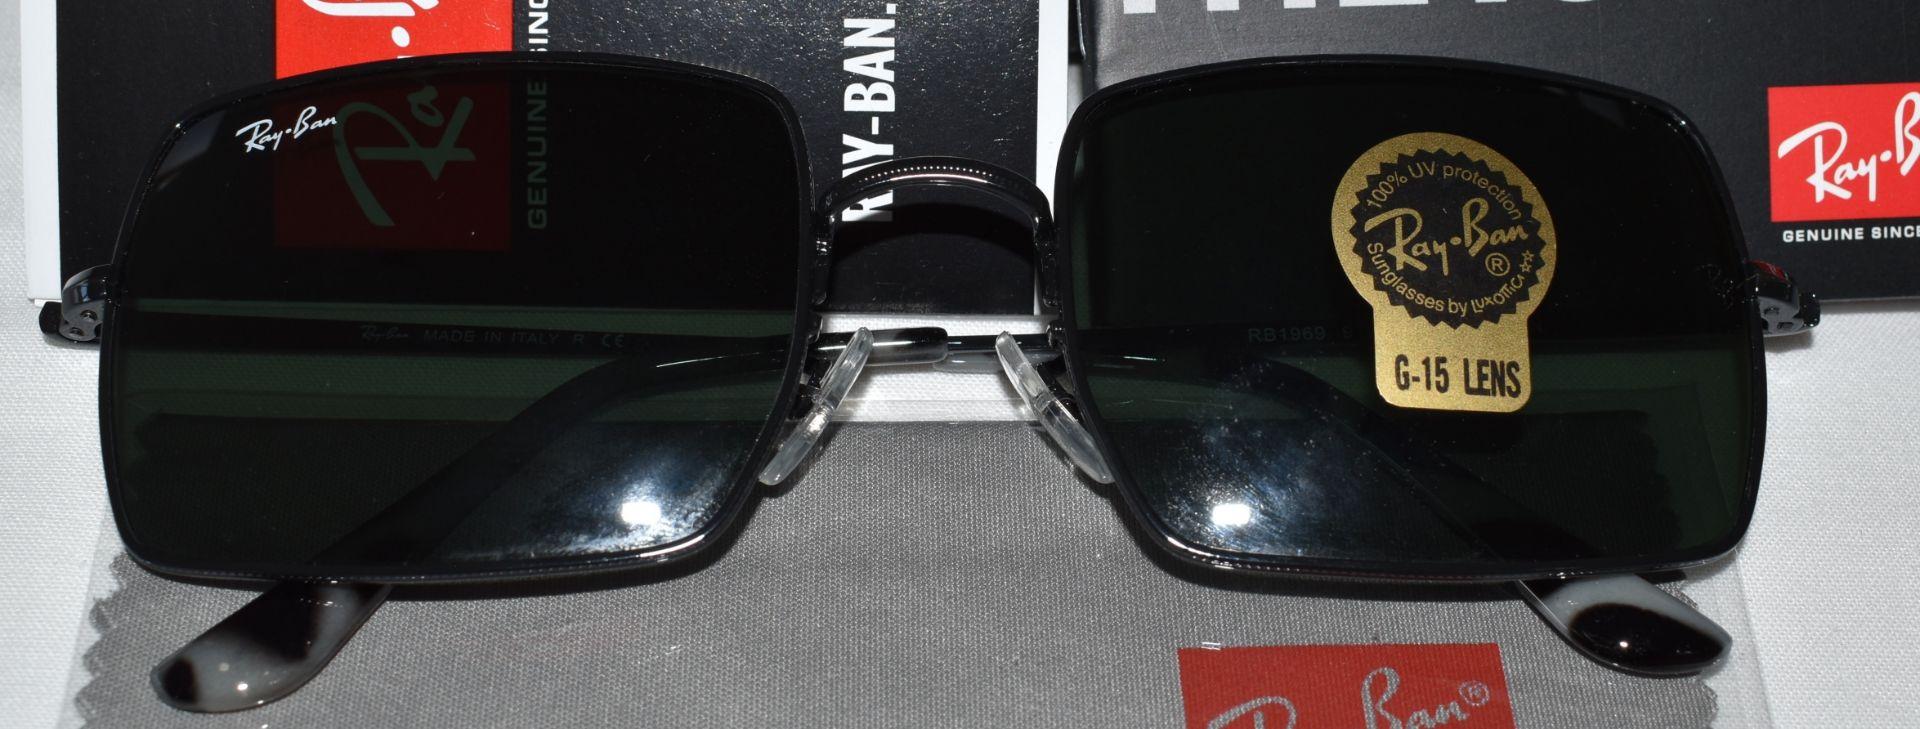 Ray Ban Sunglasses ORB1969 919931 *3N - Image 2 of 3